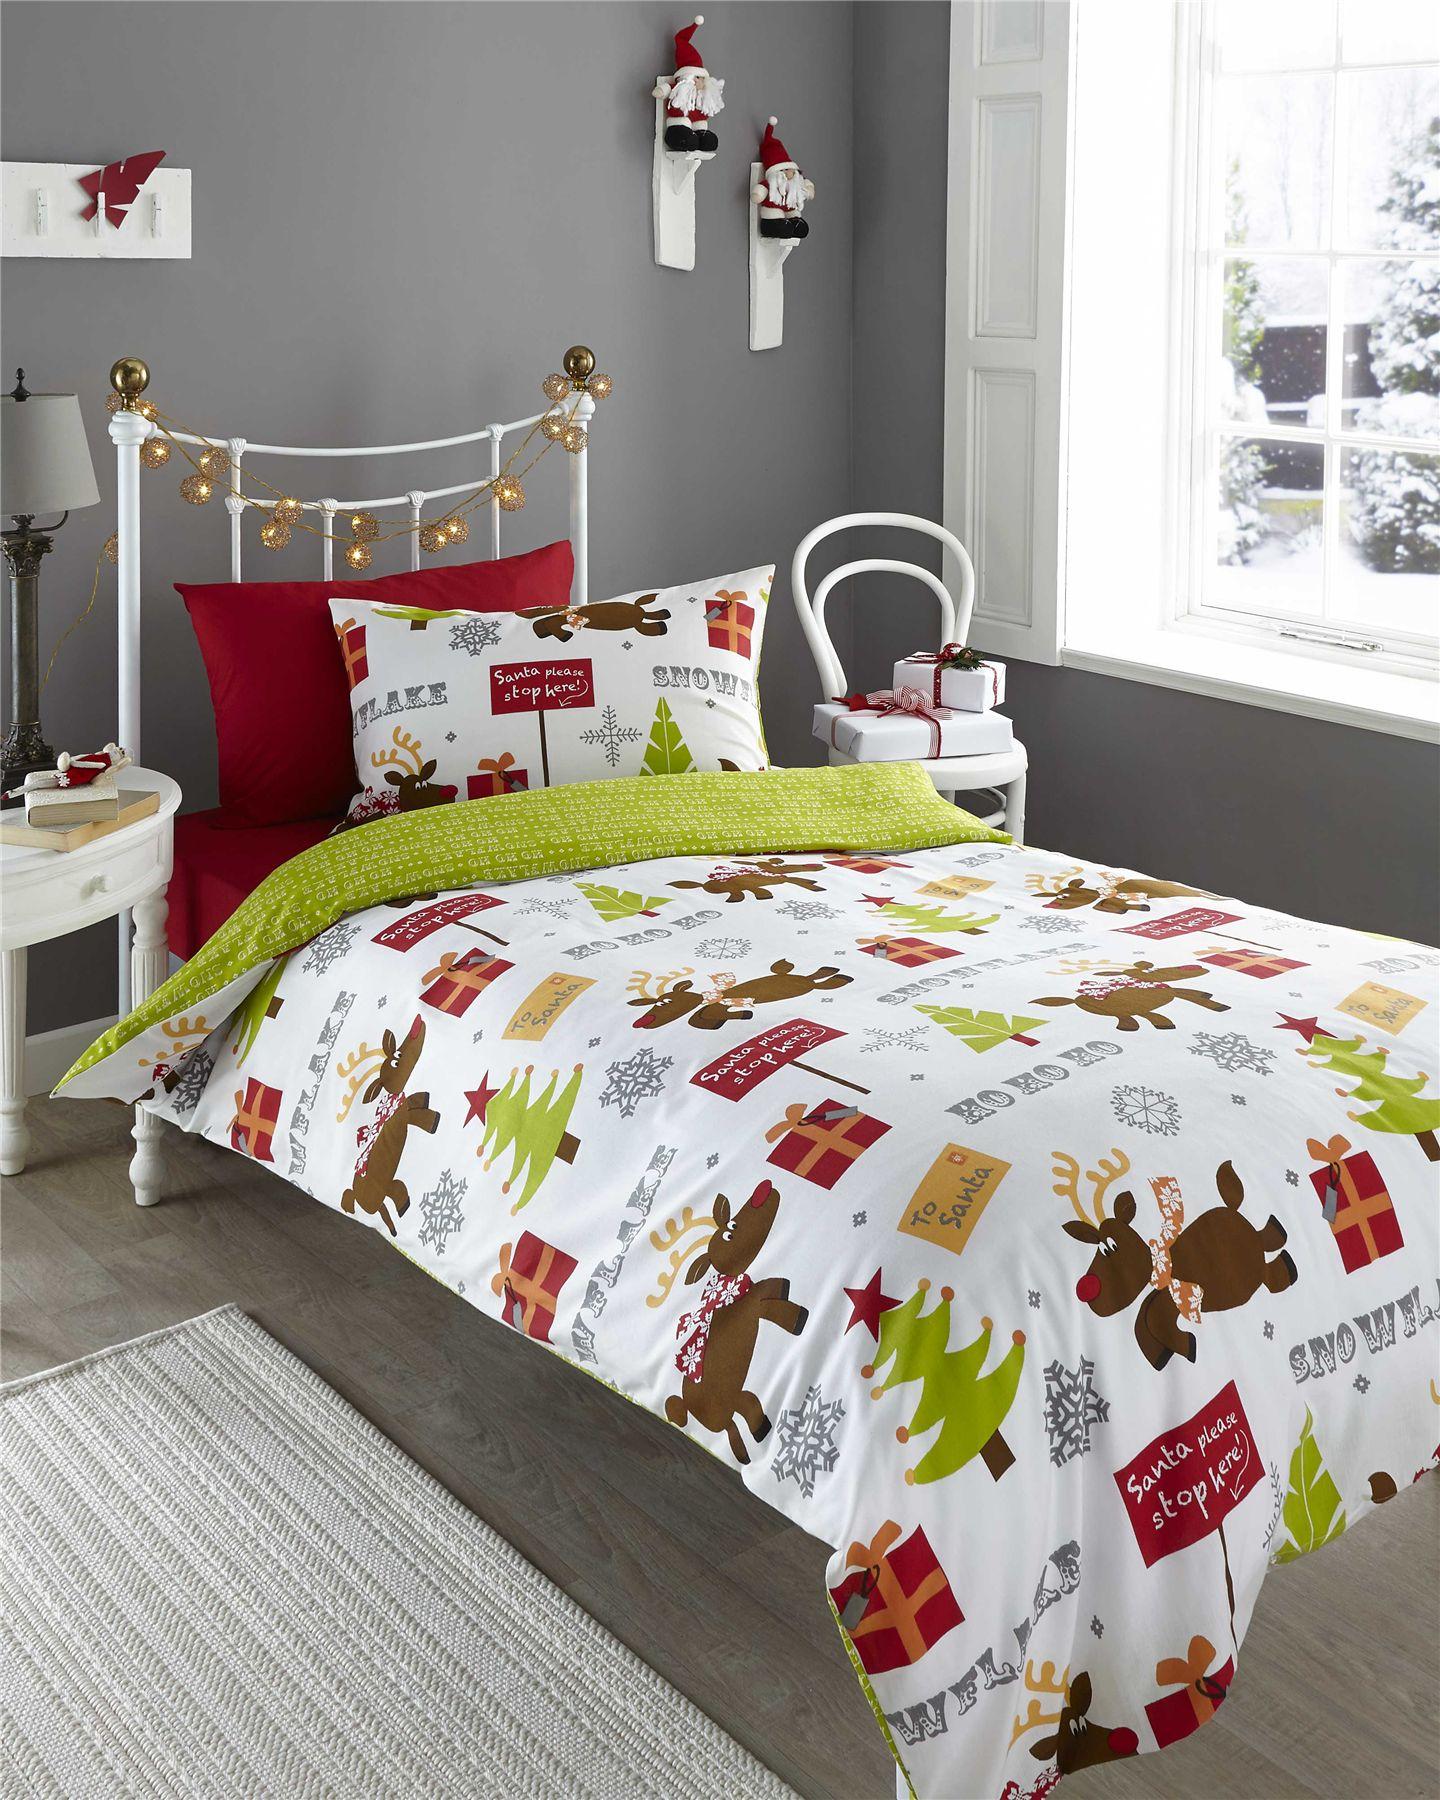 duvet cover  pillowcase bedding bed sets bed linen all sizes  - duvetcoveramppillowcasebeddingbedsetsbed